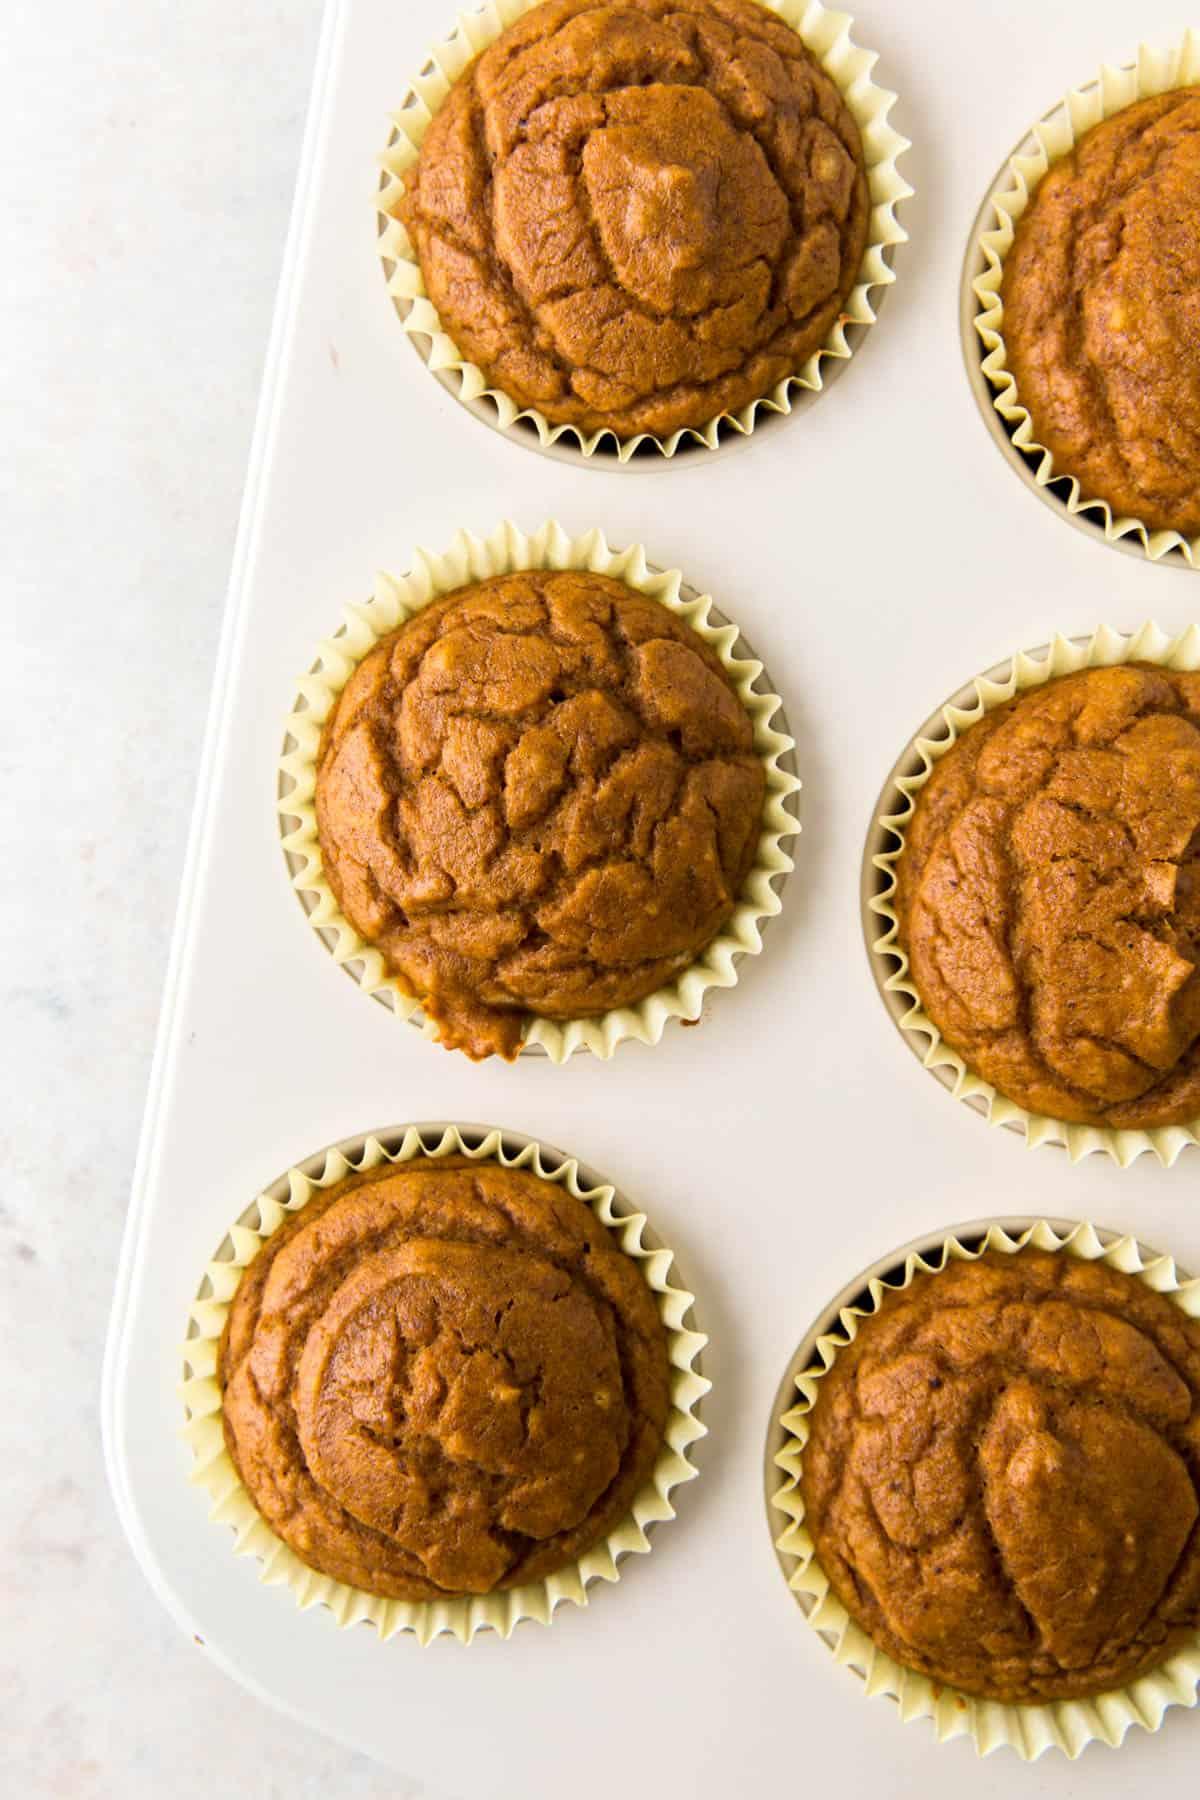 baked pumpkin muffins in a pan